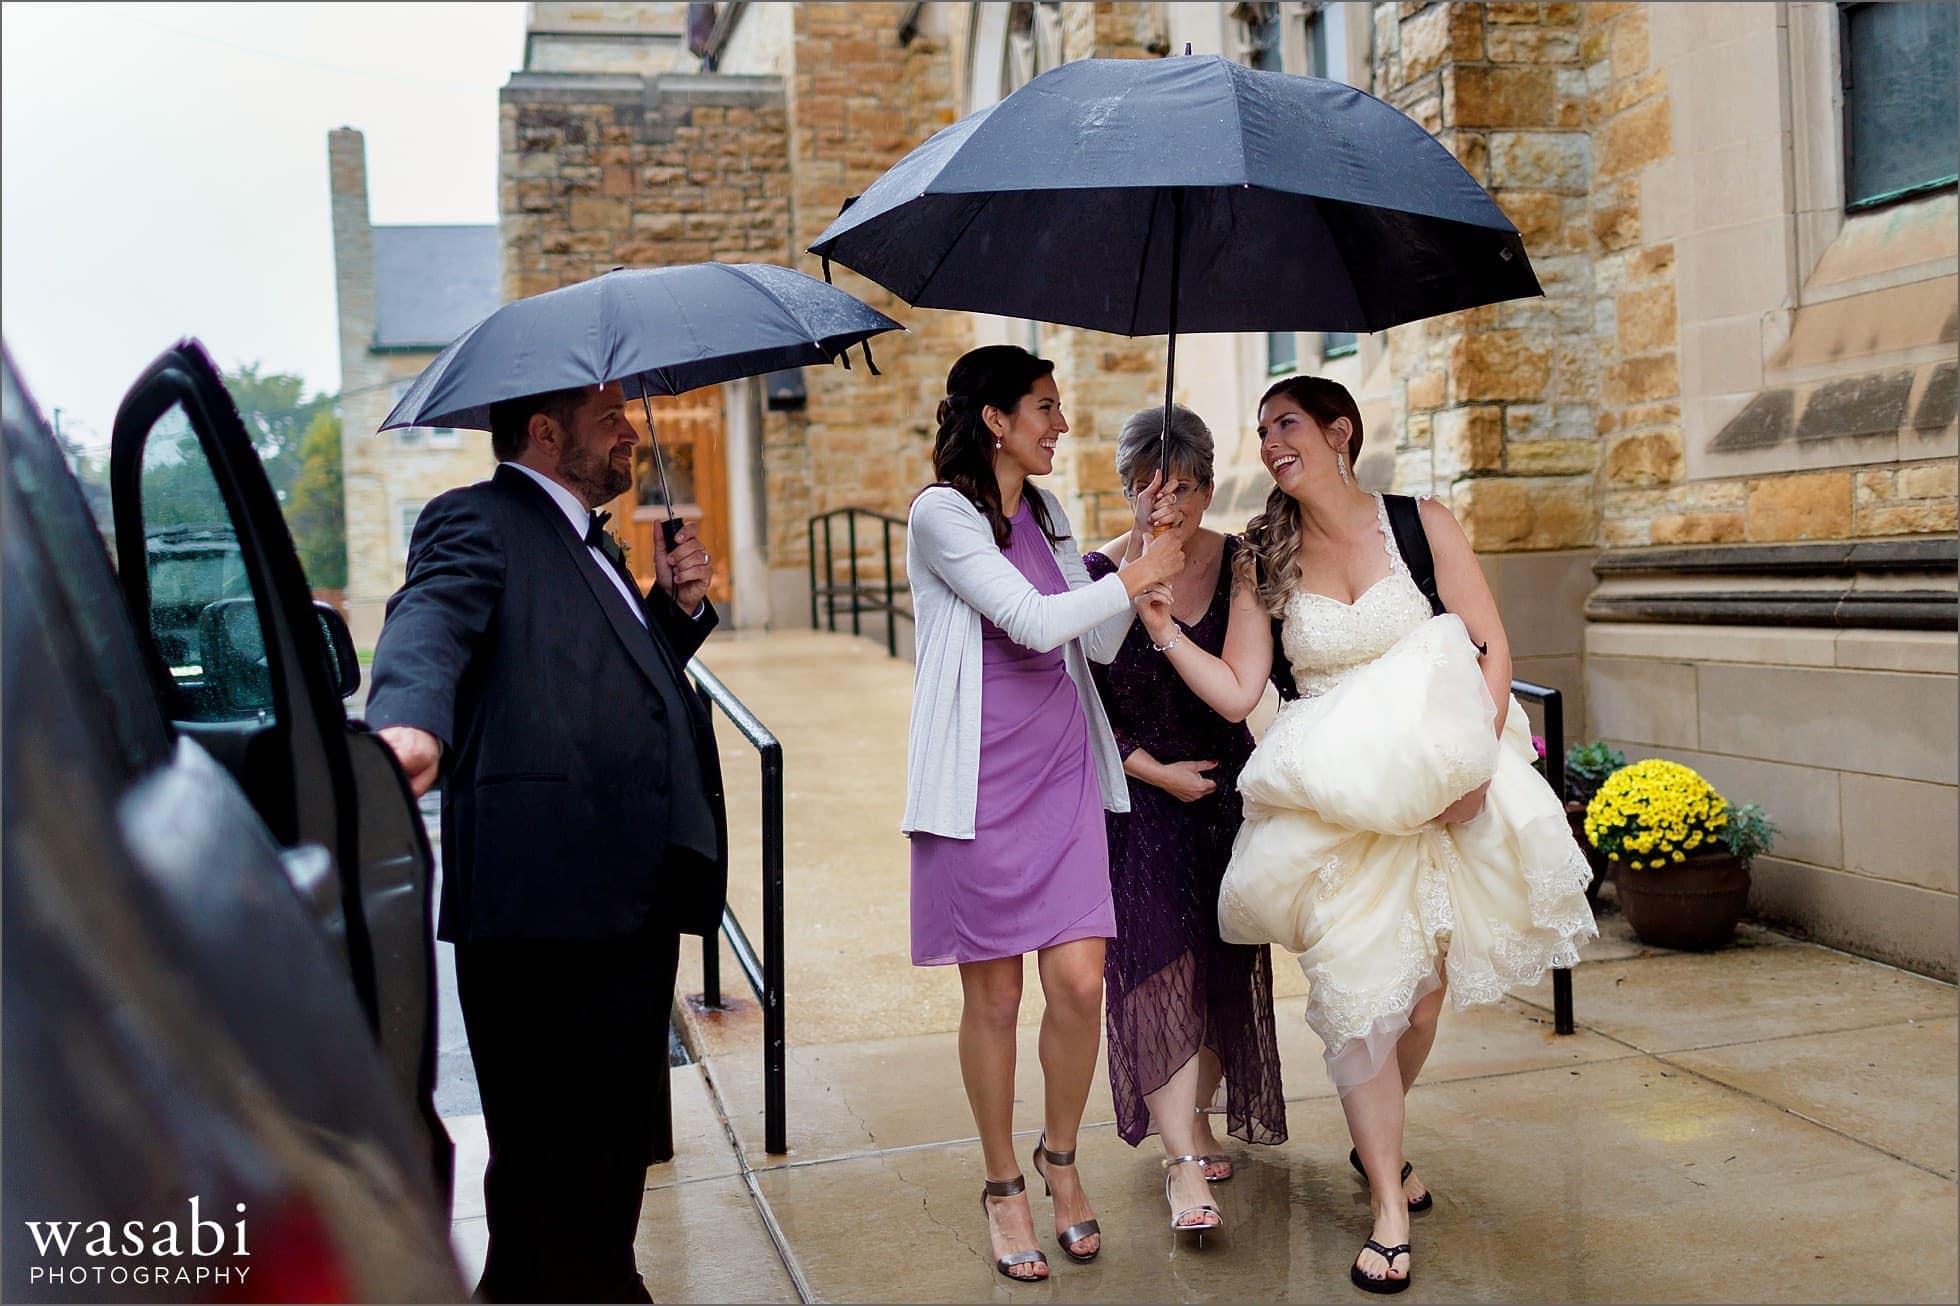 bride walks under umbrella to avoid rain while leaving ceremony at St Luke Roman Catholic Church in River Forest